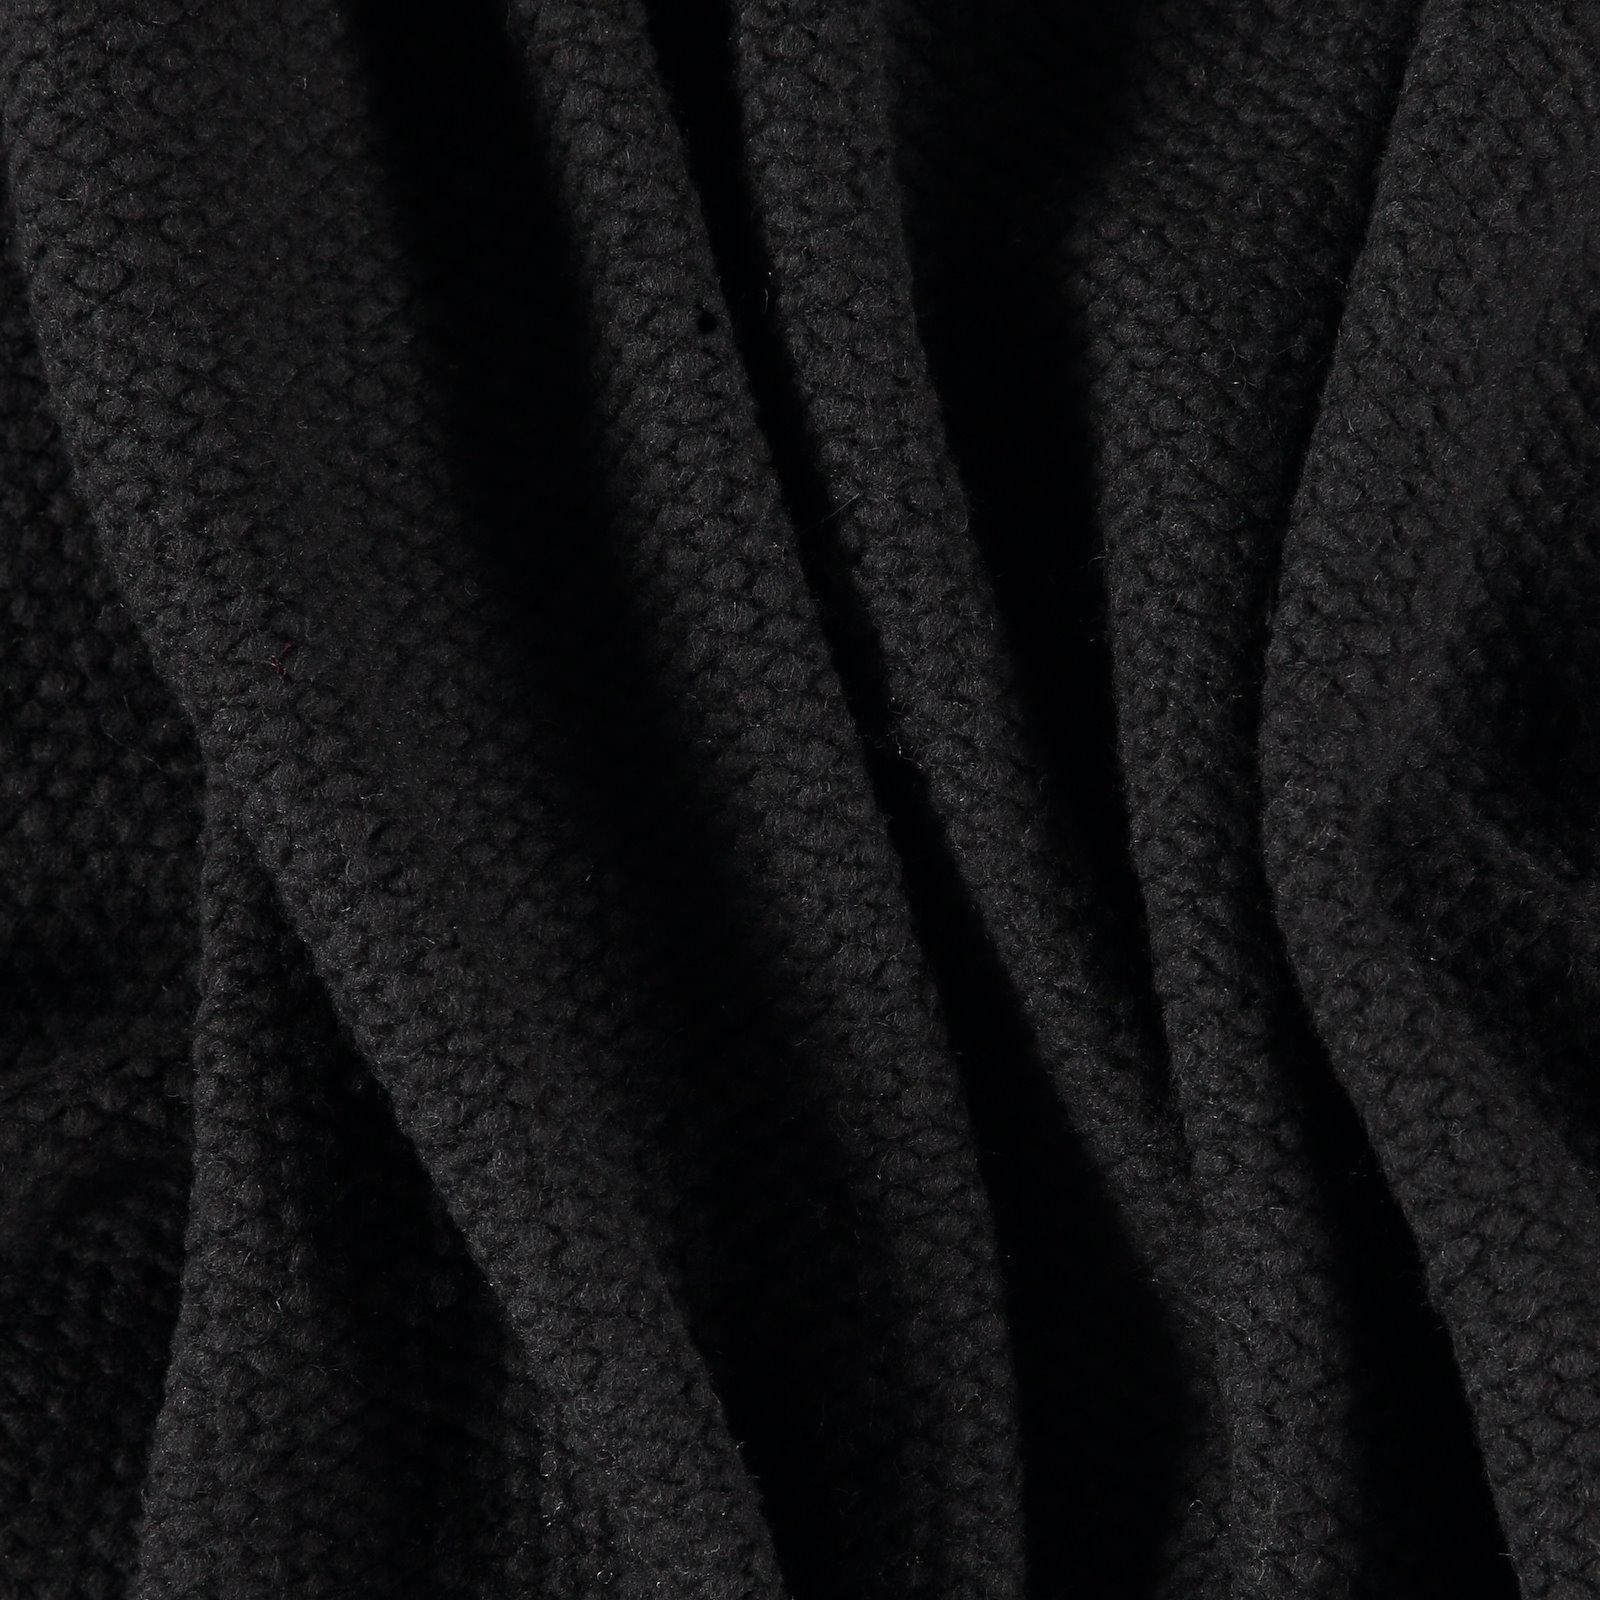 Knit wool boucle black